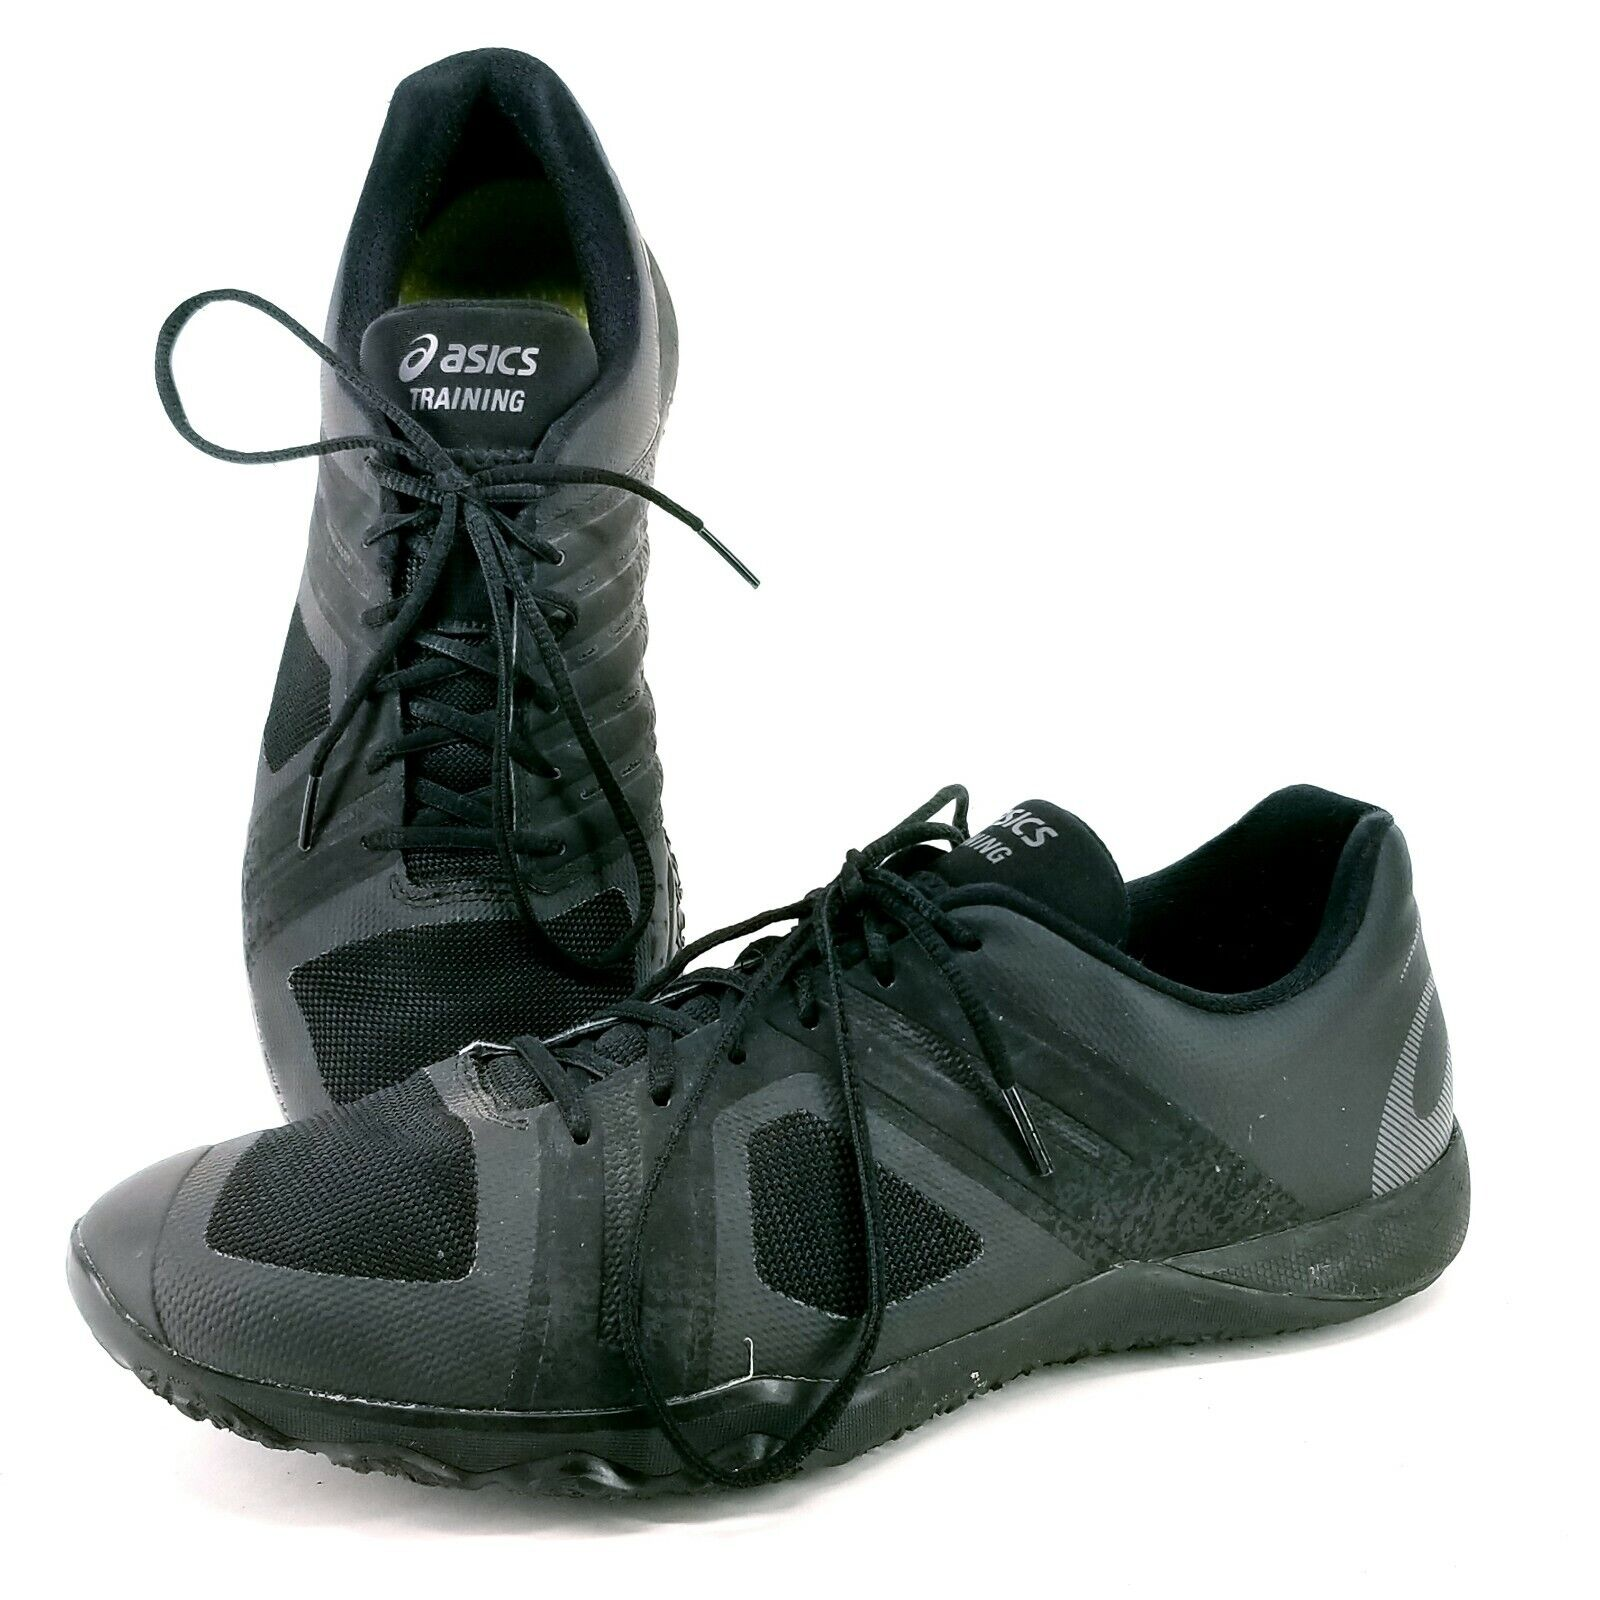 Metropolitano suspender tubo respirador  ASICS Mens Conviction X 2 Shoes S802n Deep Ocean/black Size 10 for sale  online   eBay